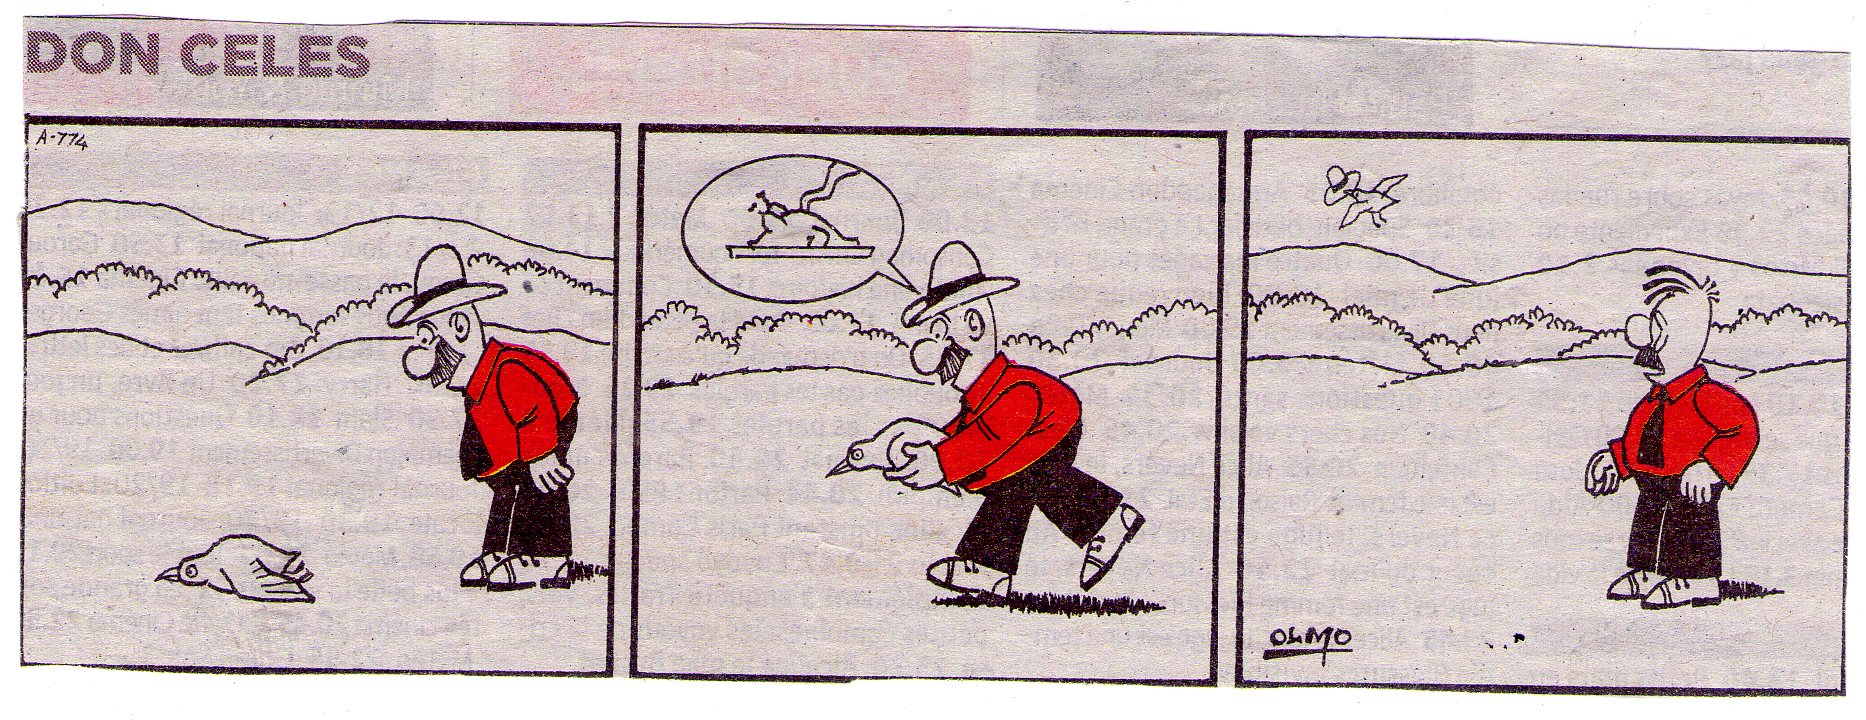 Le roban el sombrero a Don Celes